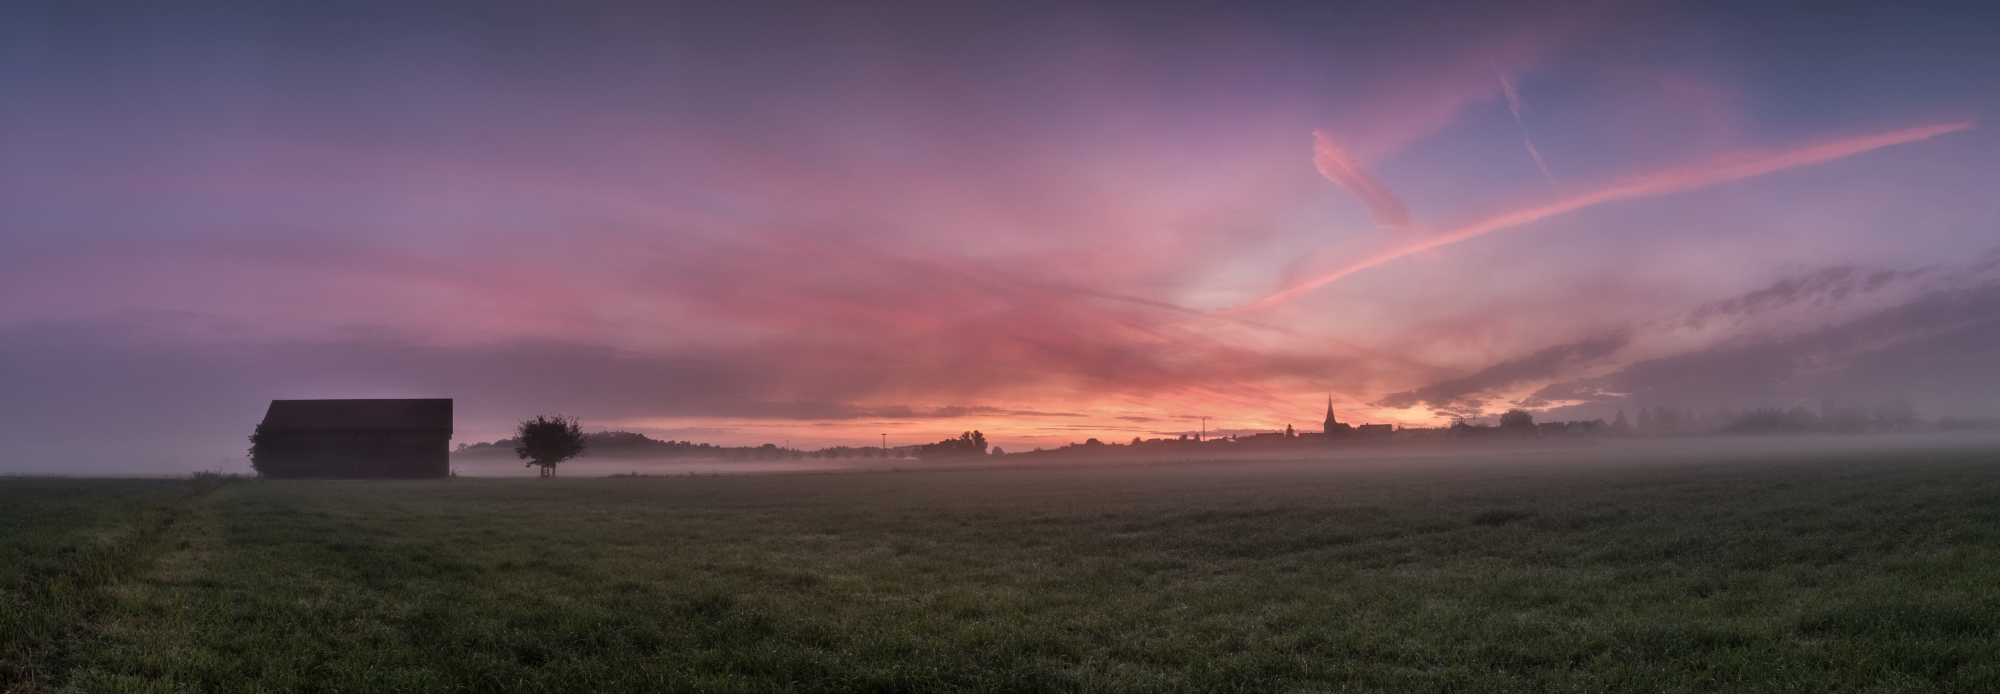 Leerstetten Sunrise, Germany